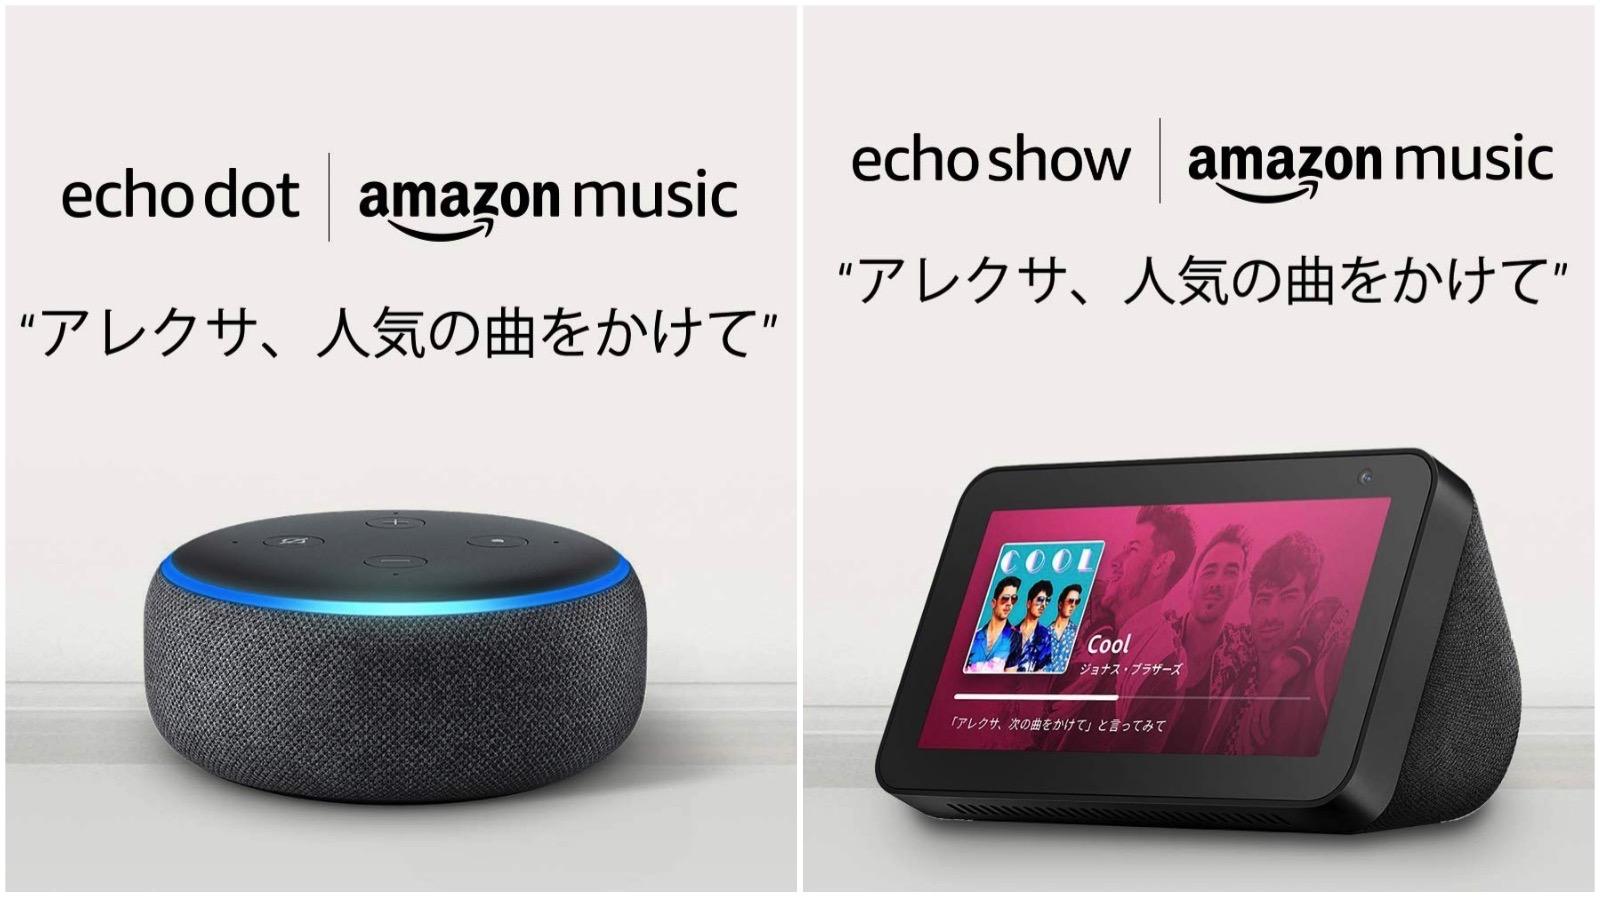 Amazon Music Set 6month free